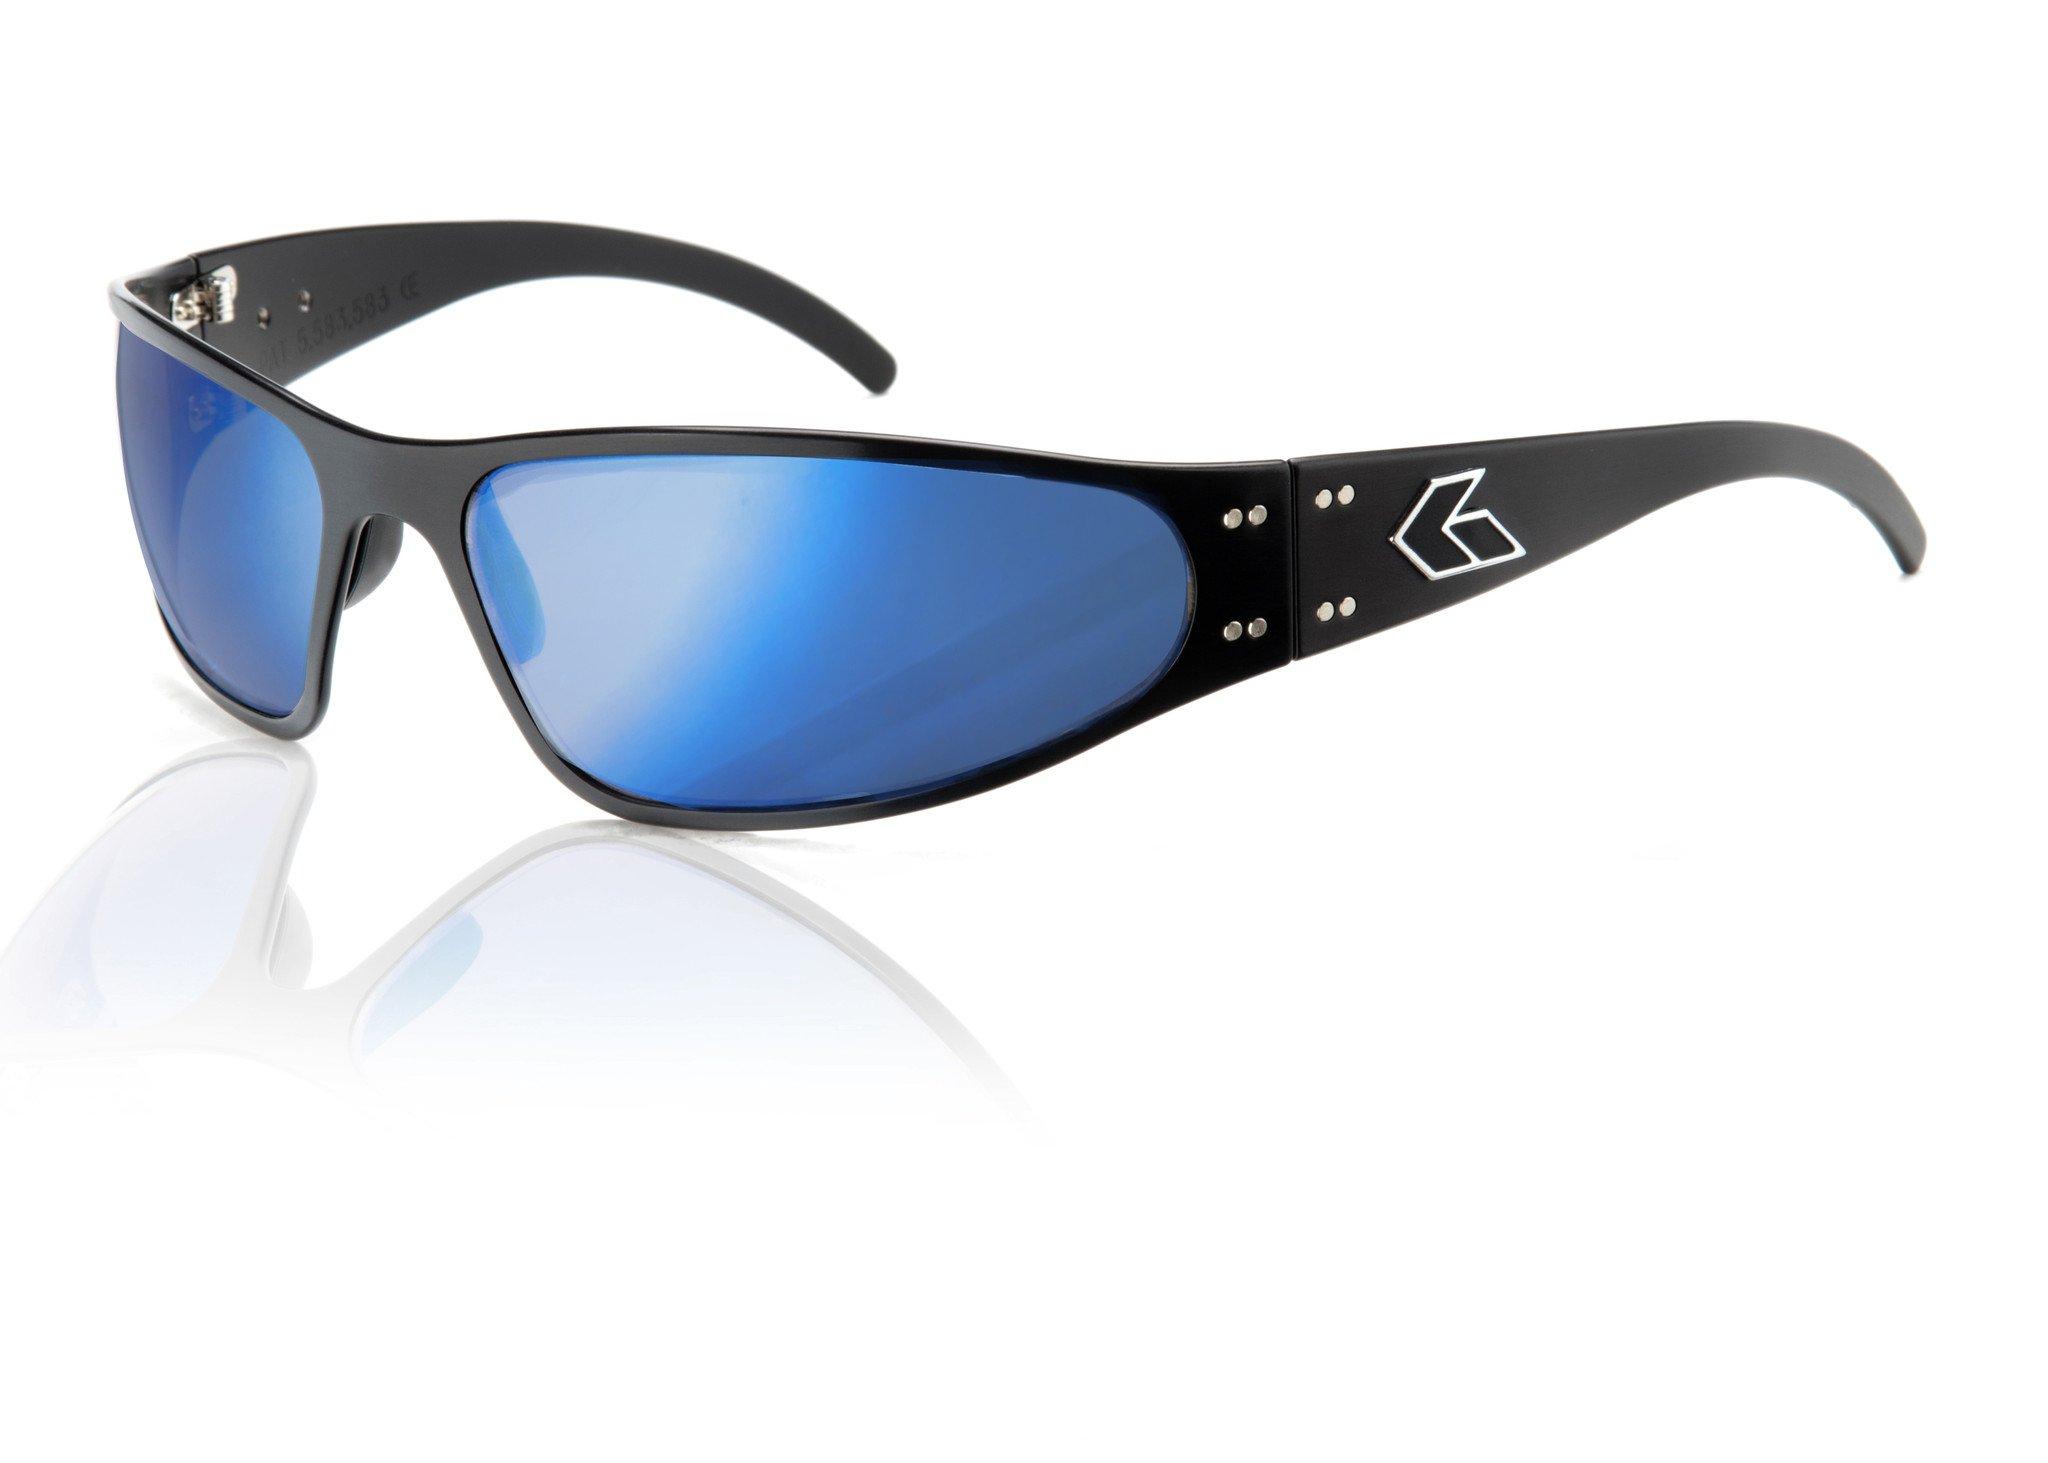 Gatorz Eyewear, Wraptor Model, Aluminum Frame Sunglasses - Black/Smoked w/Blue Mirror Lens by Gatorz